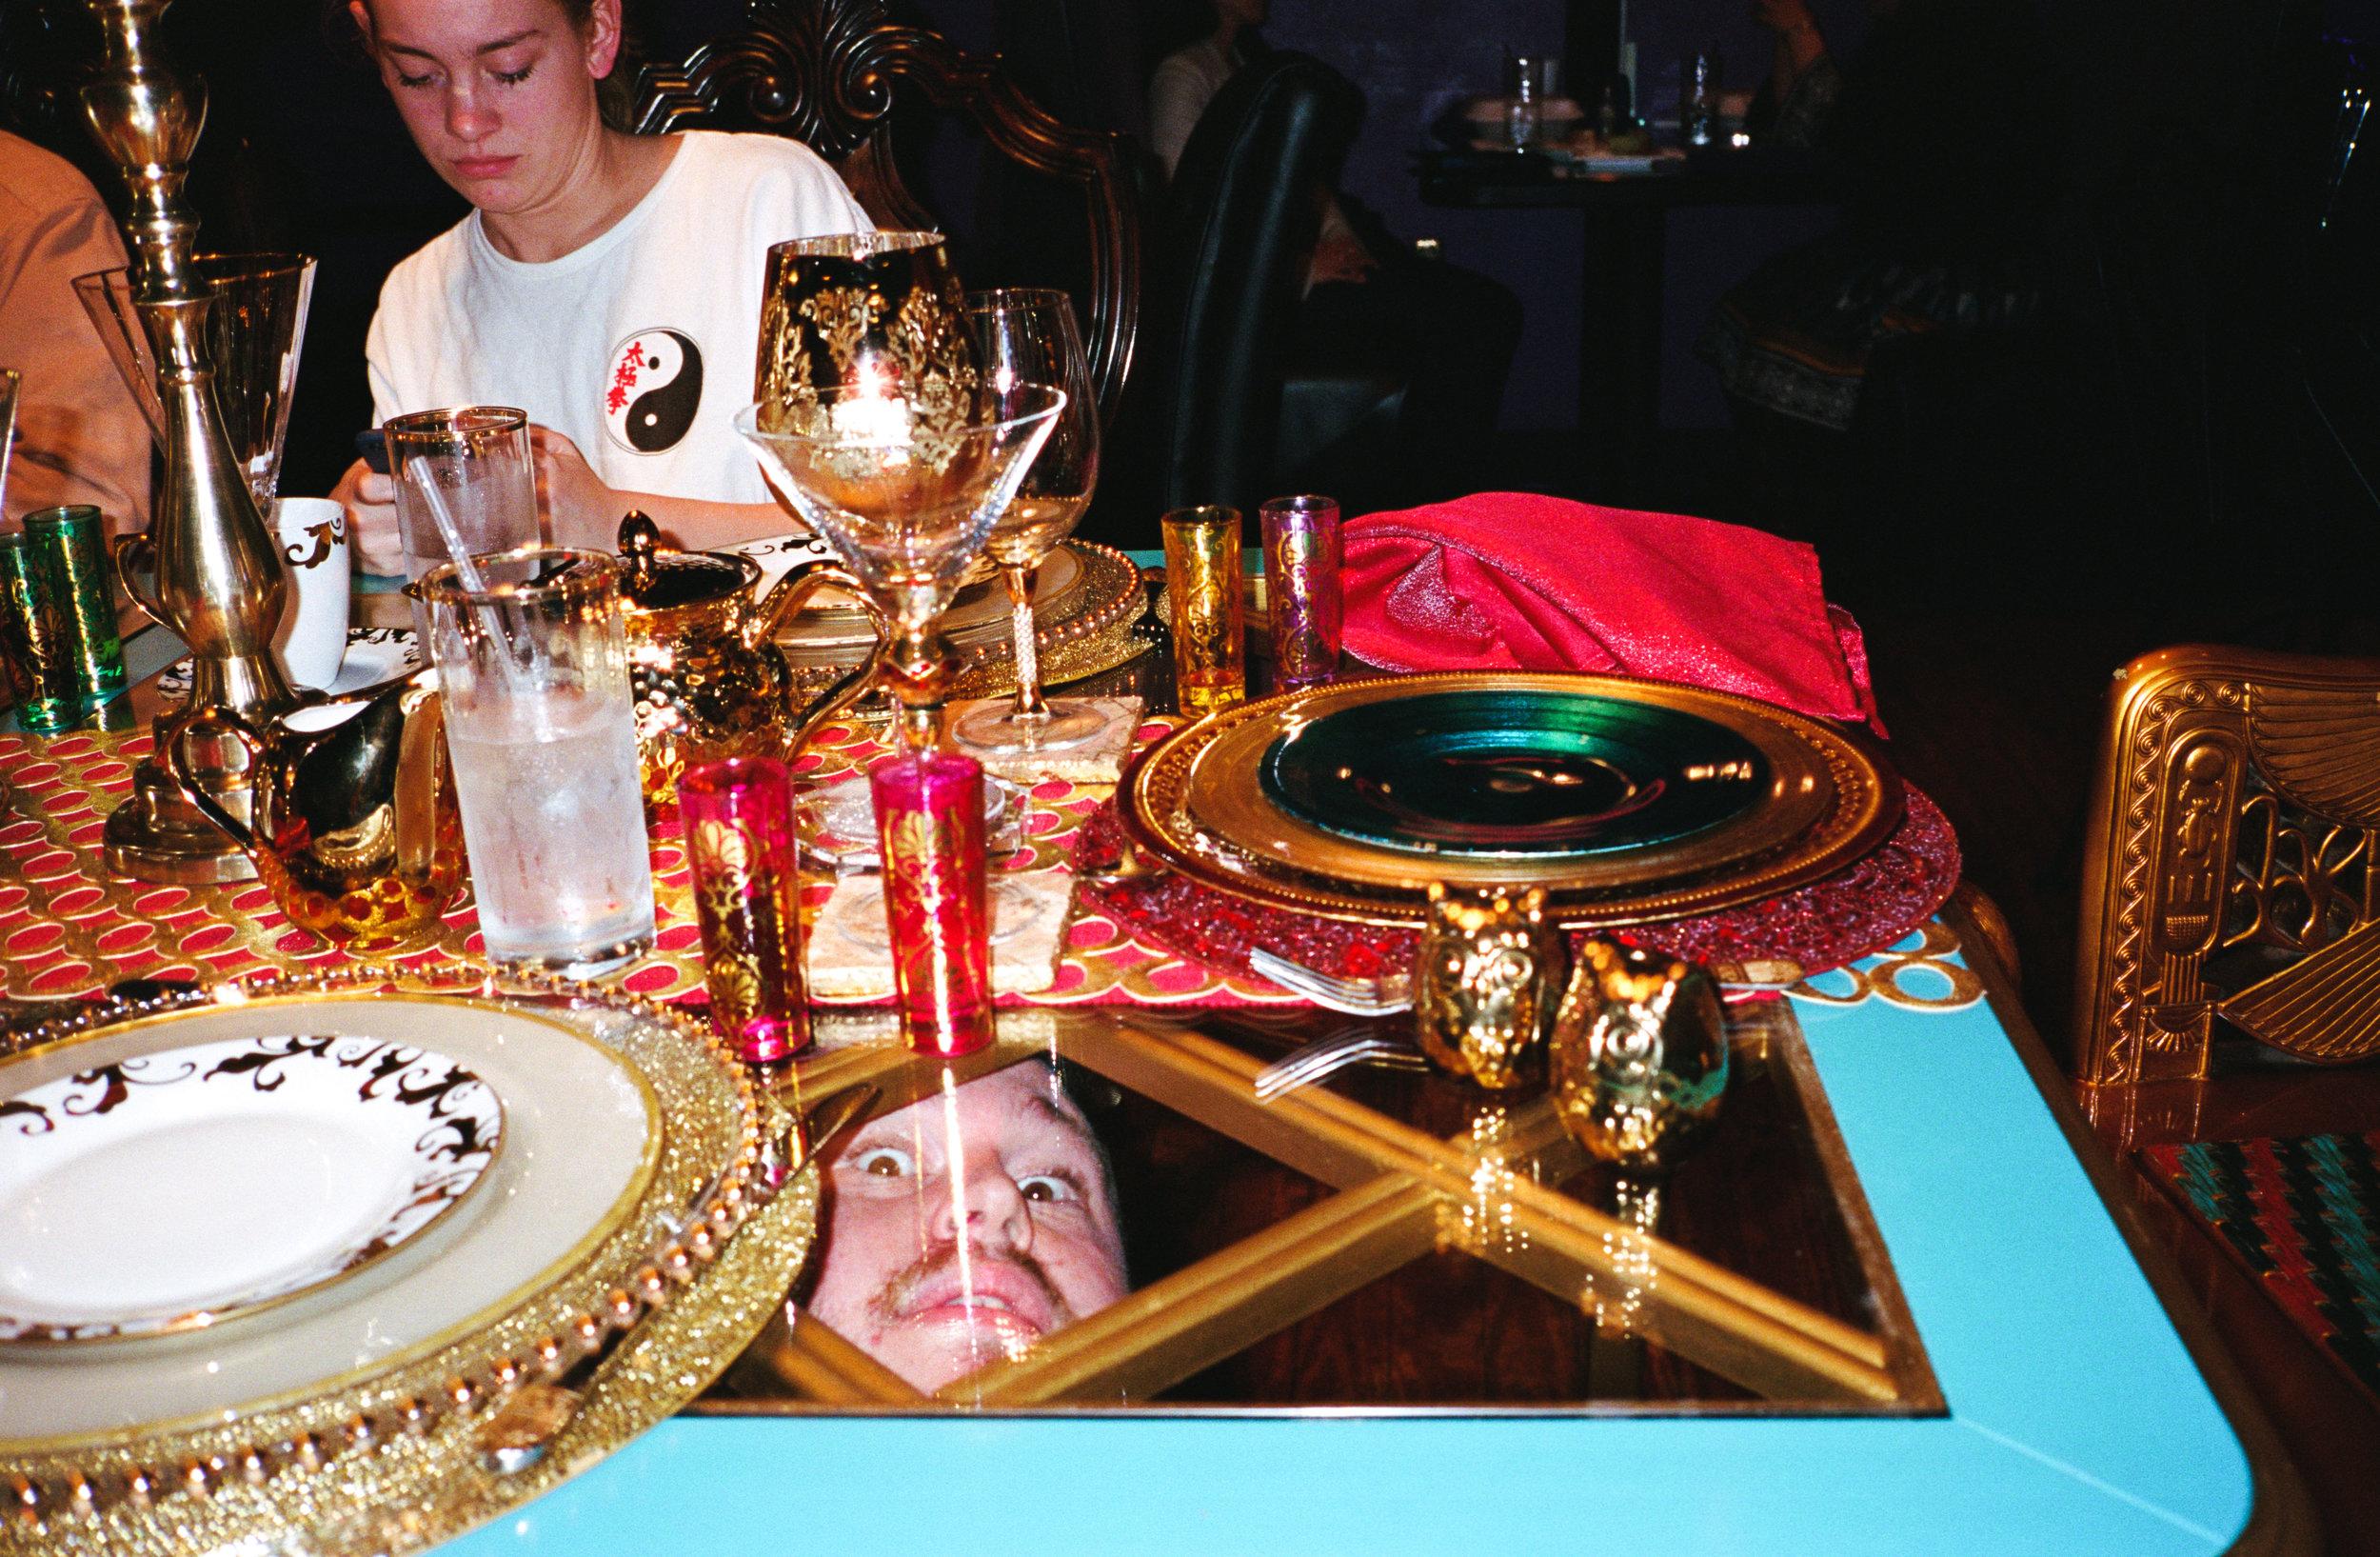 under table-1.jpg